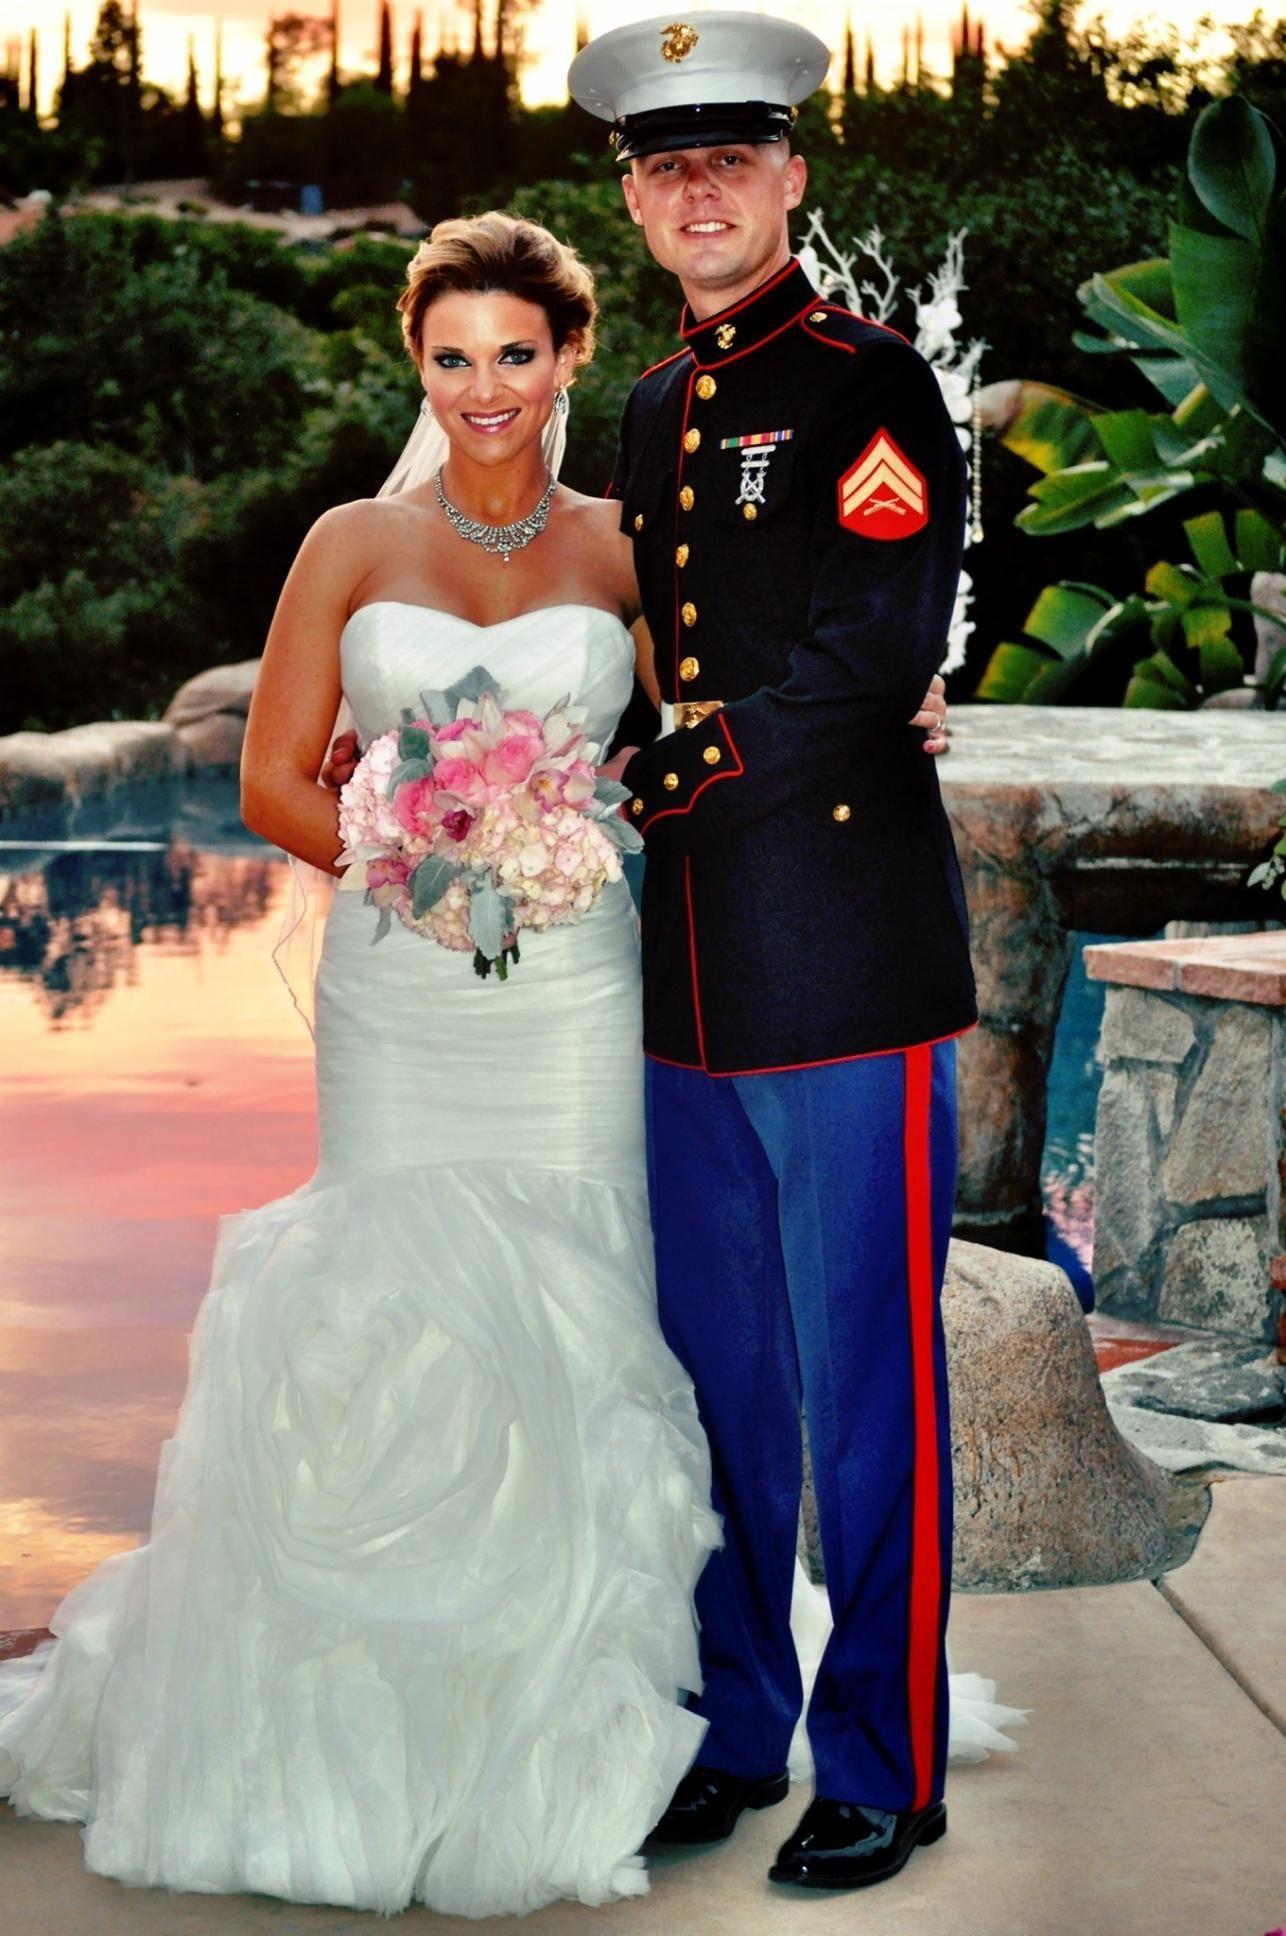 Outdoor marine wedding my purple marine wedding for Marine wedding bridesmaid dresses